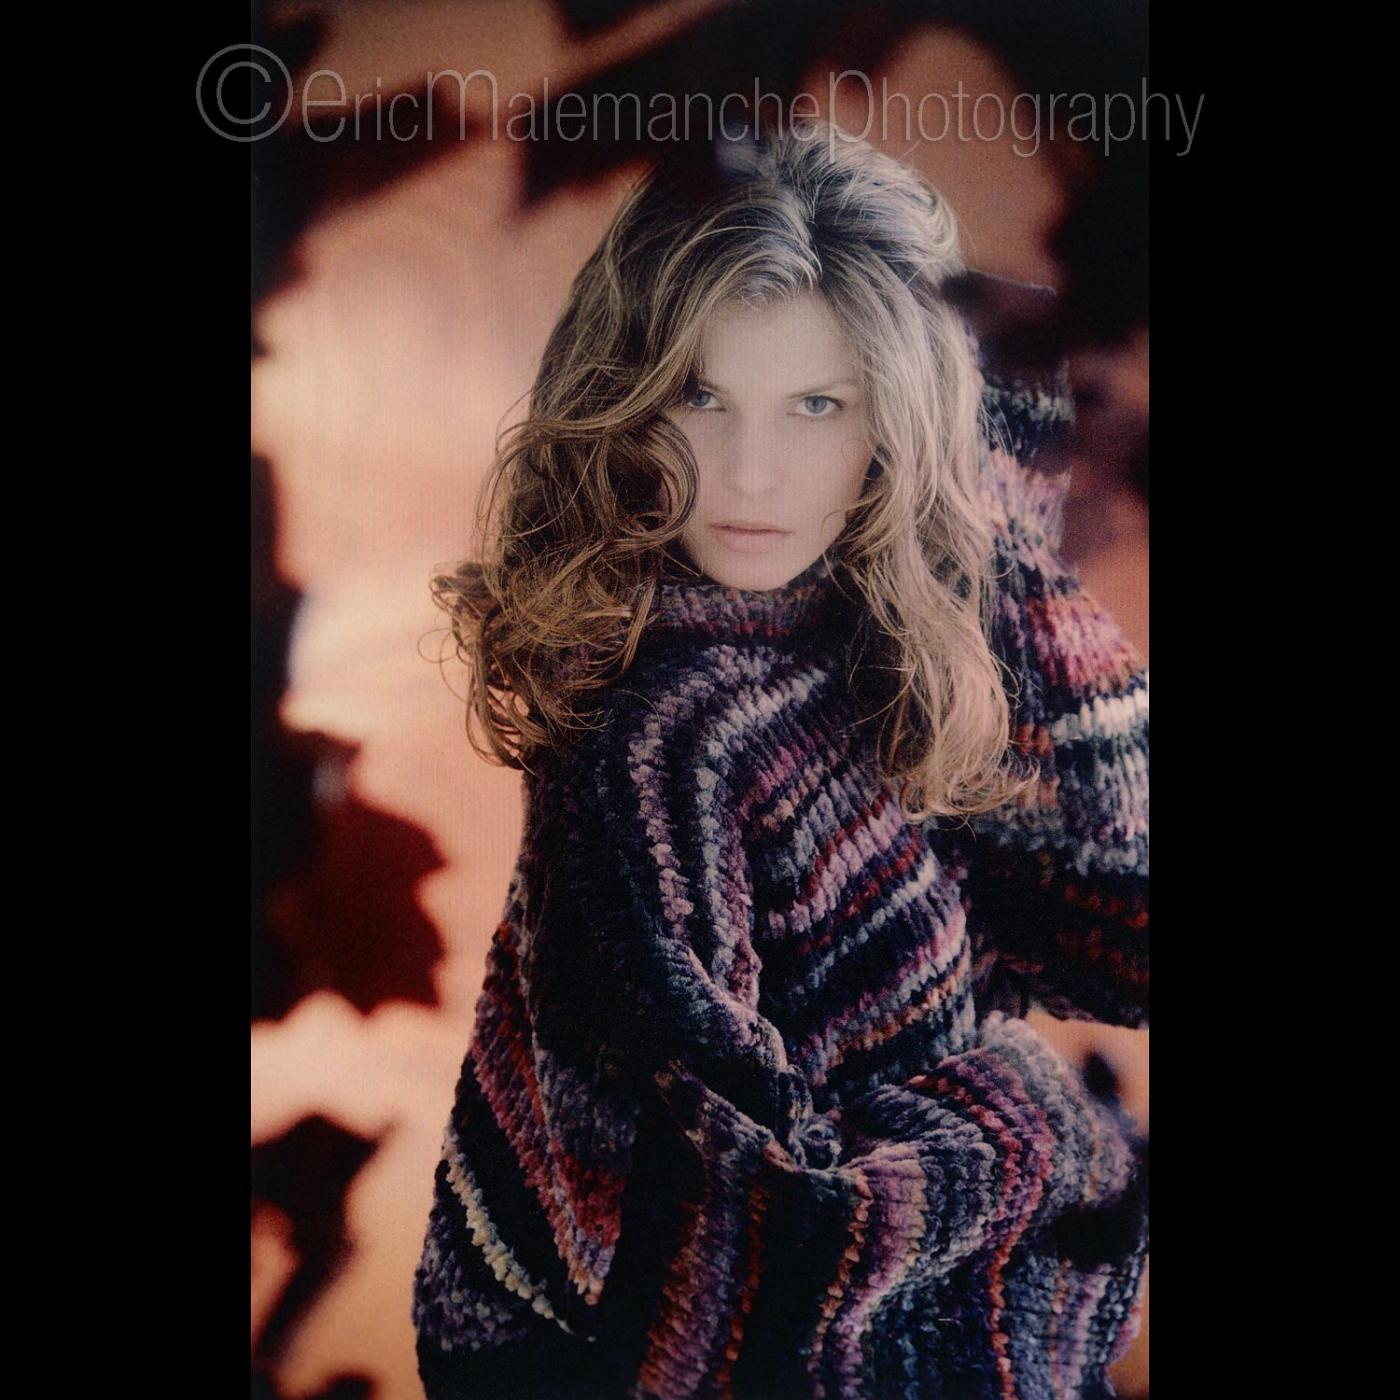 http://www.ericmalemanche.com/imagess/topics/fashion-90-s/liste/Fashion-Zapa-antomne.jpg